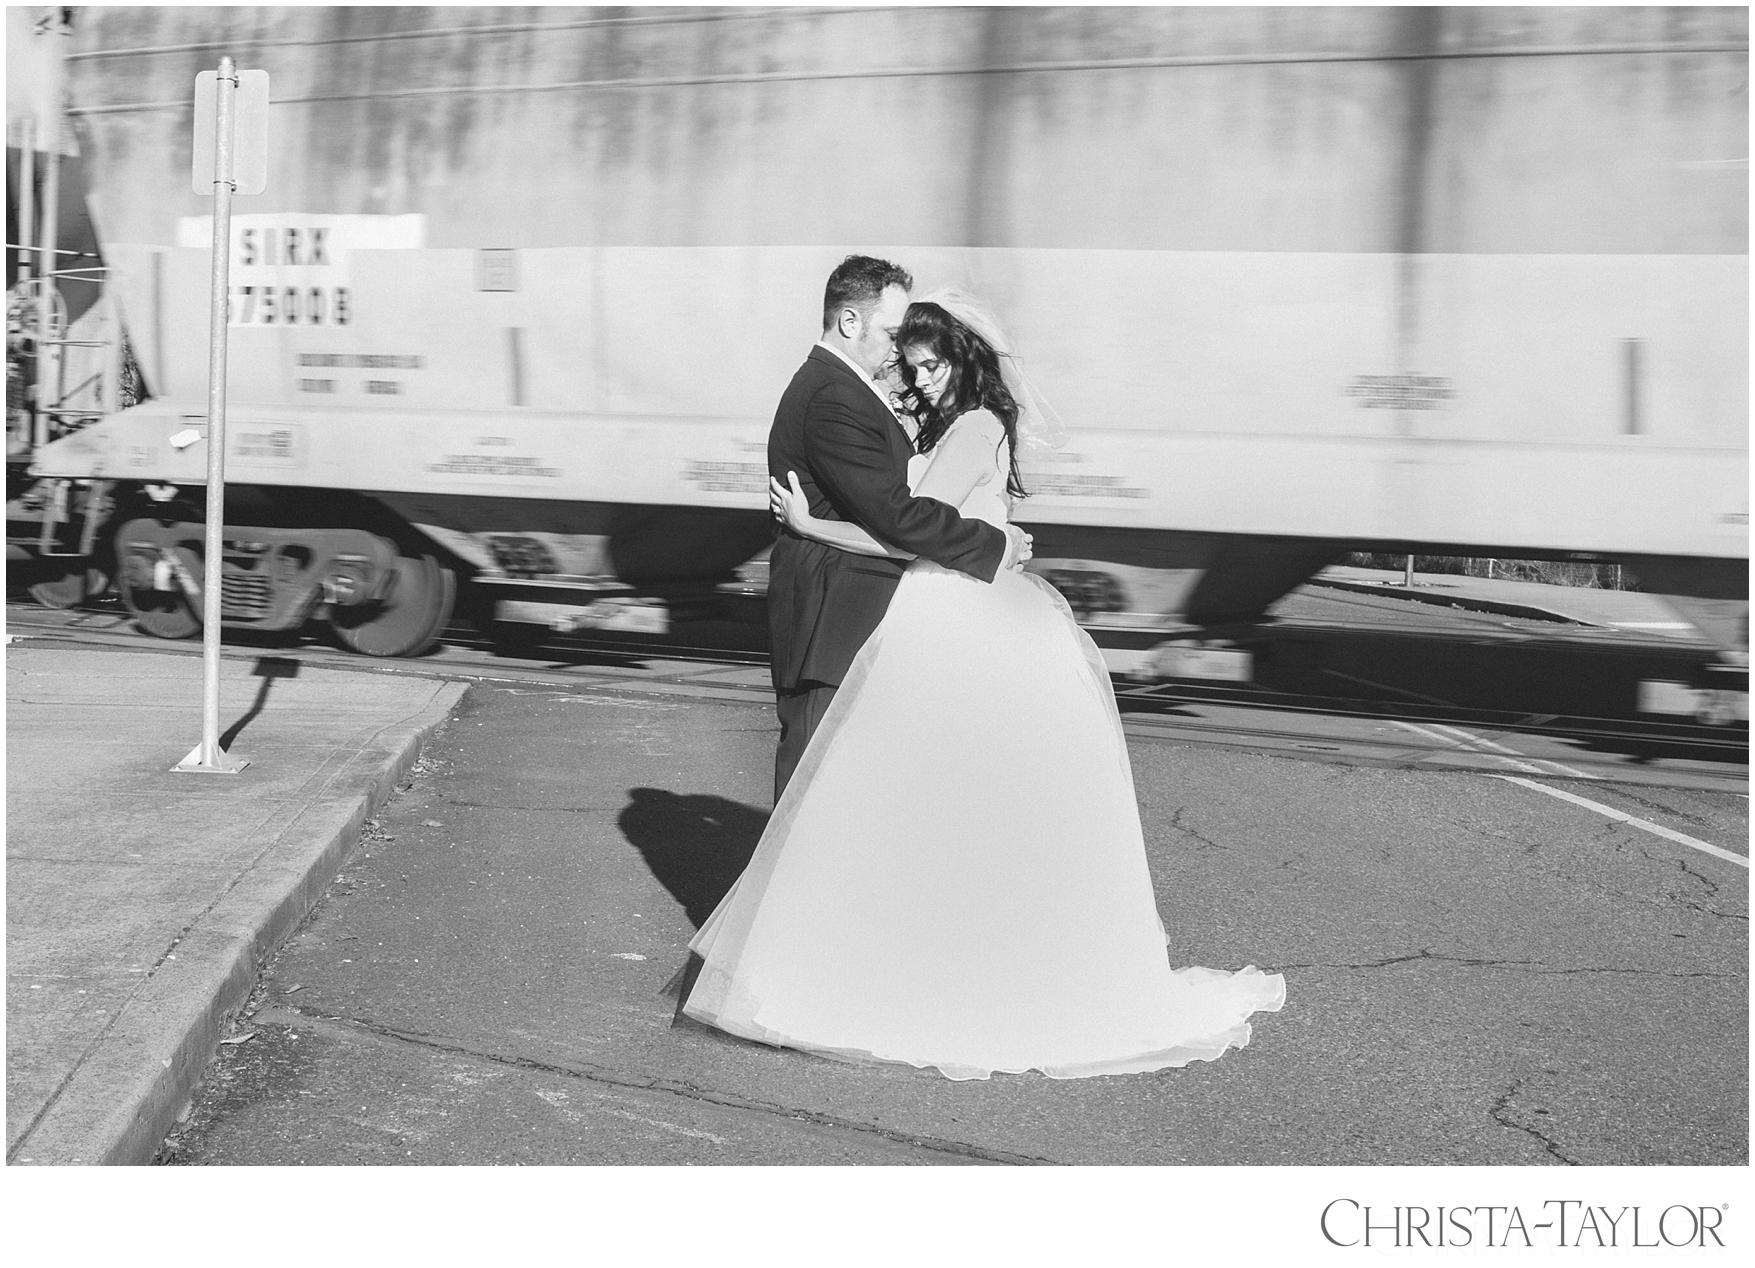 castaway portland wedding christa taylor_2270.jpg